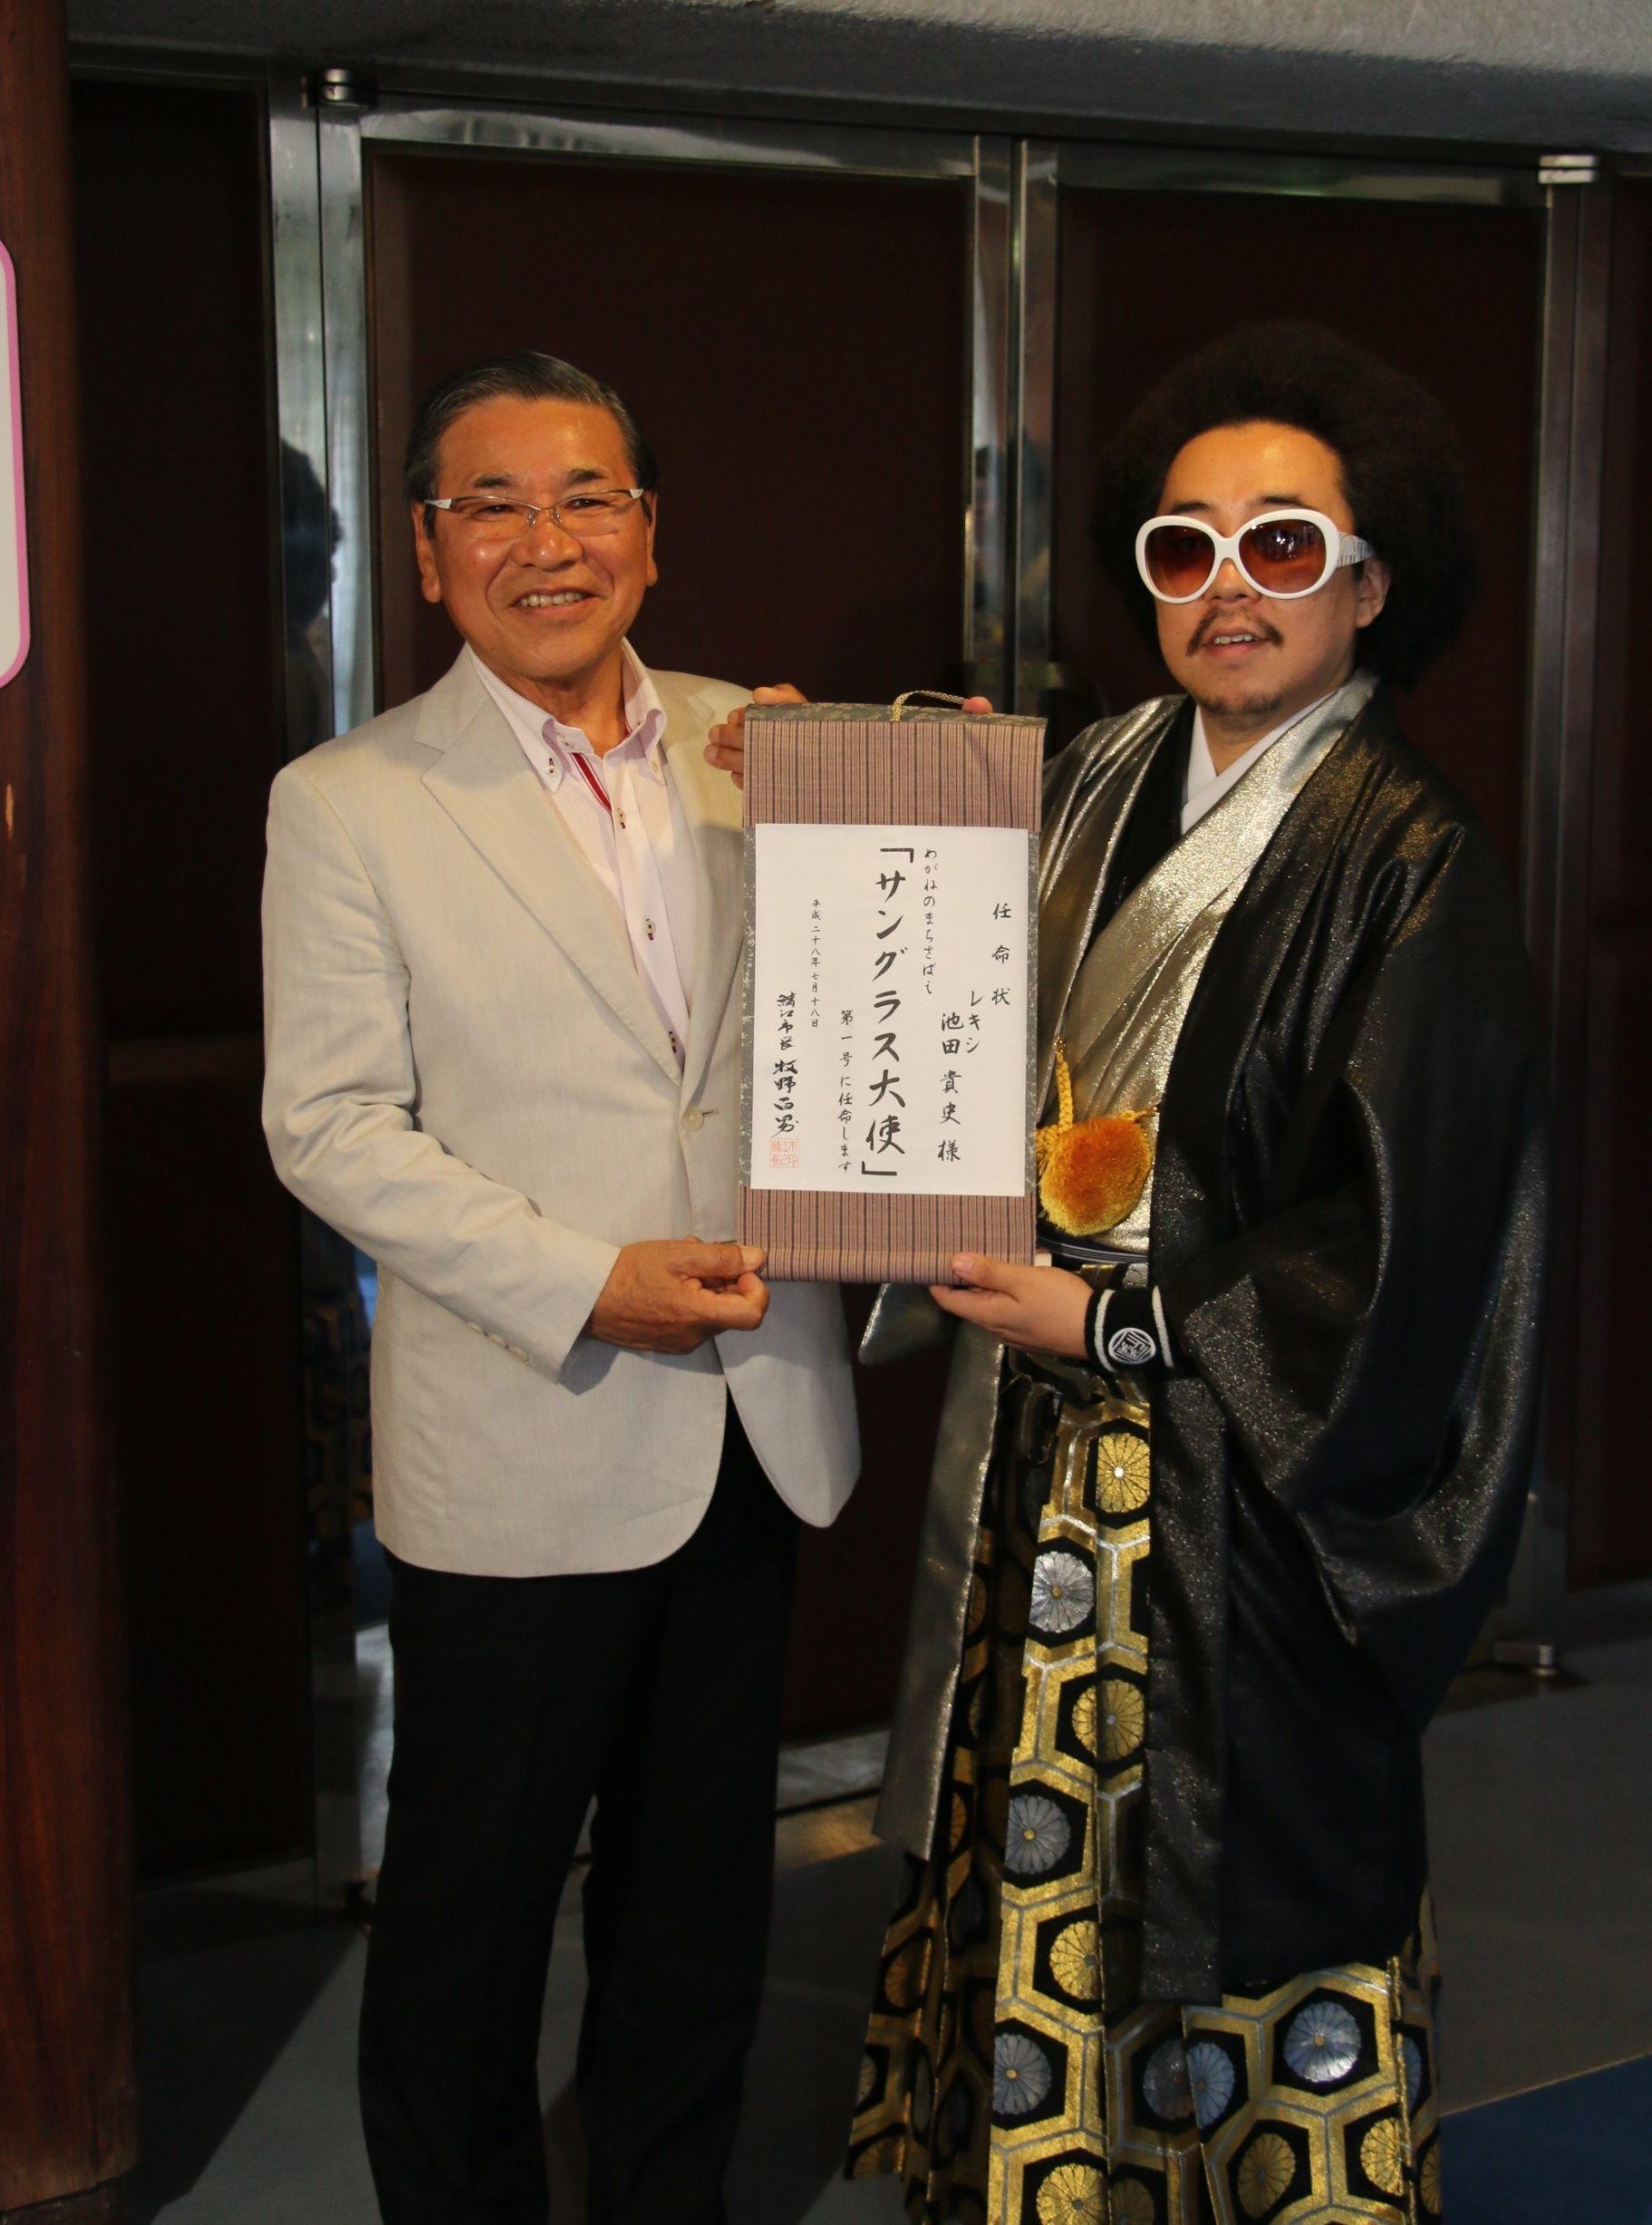 レキシ / 牧野百男鯖江市長